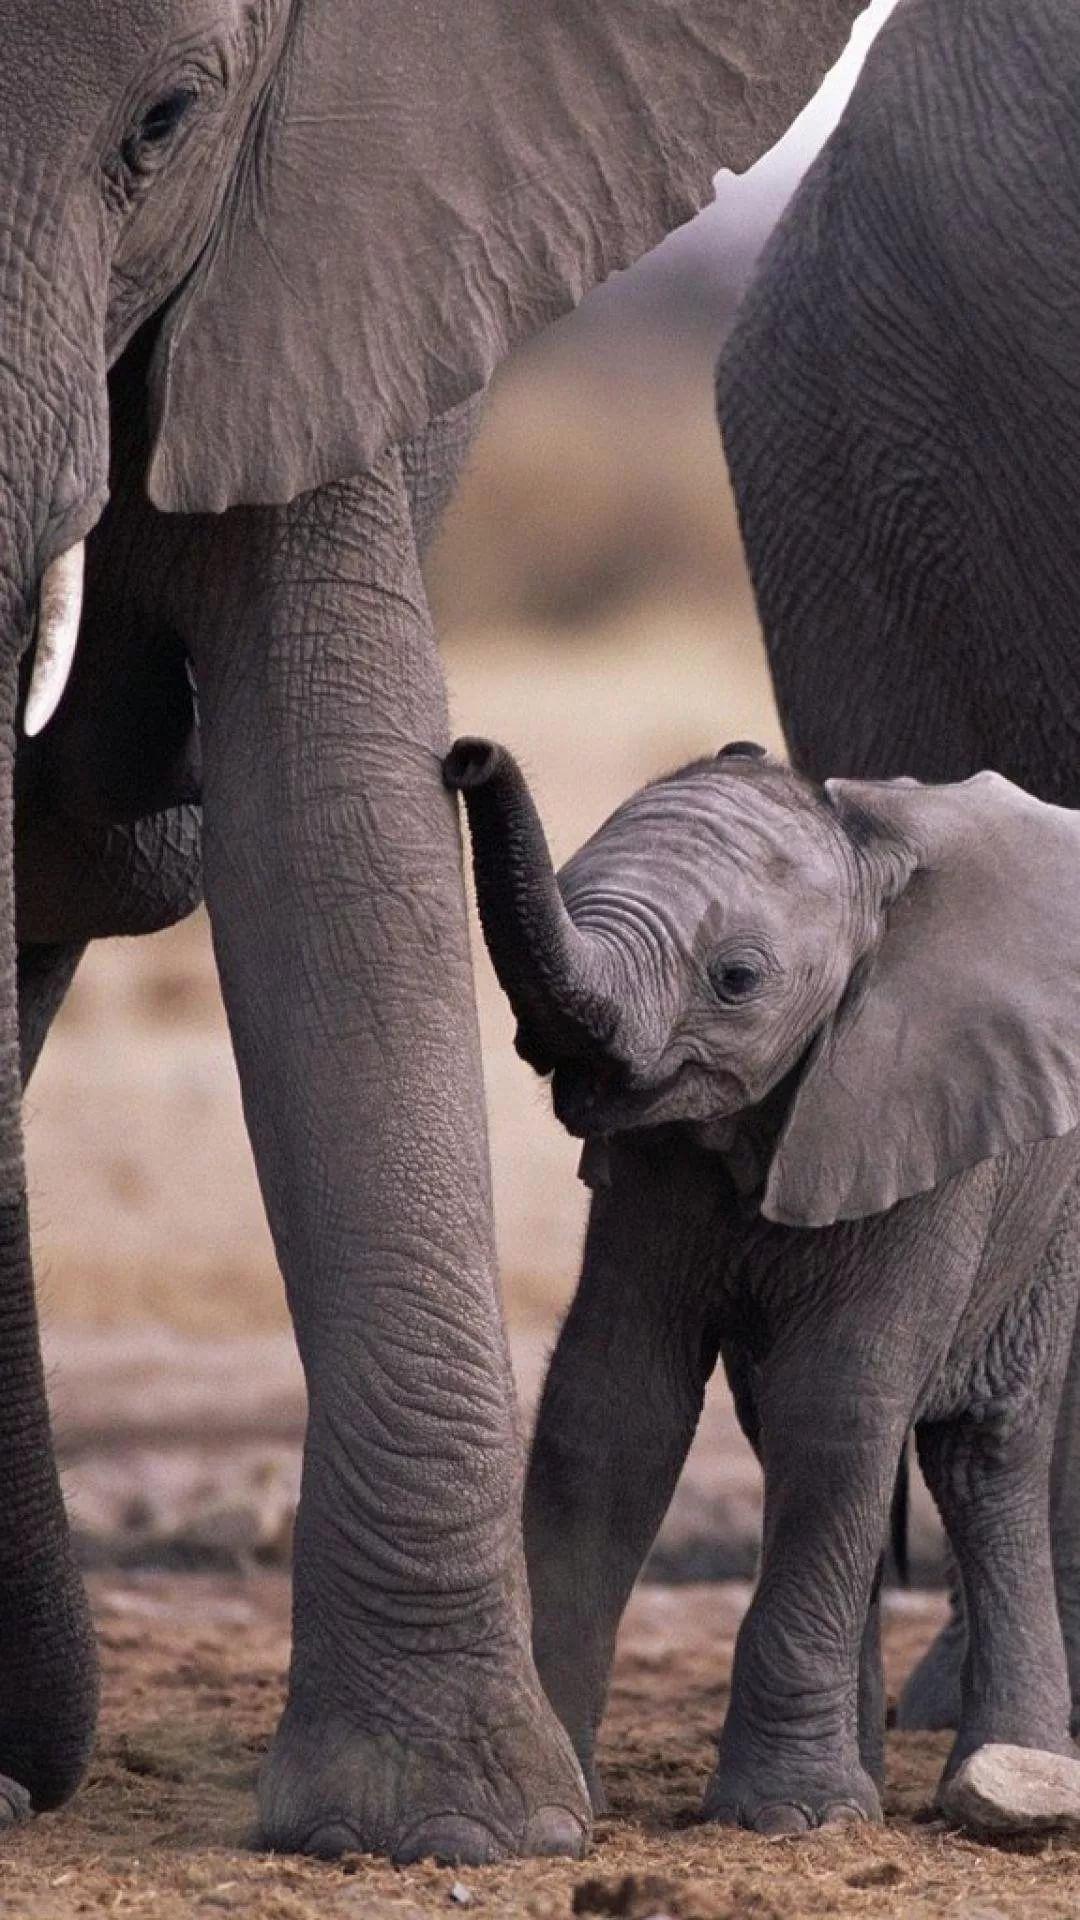 Elephant Tumblr iPhone 5 wallpaper